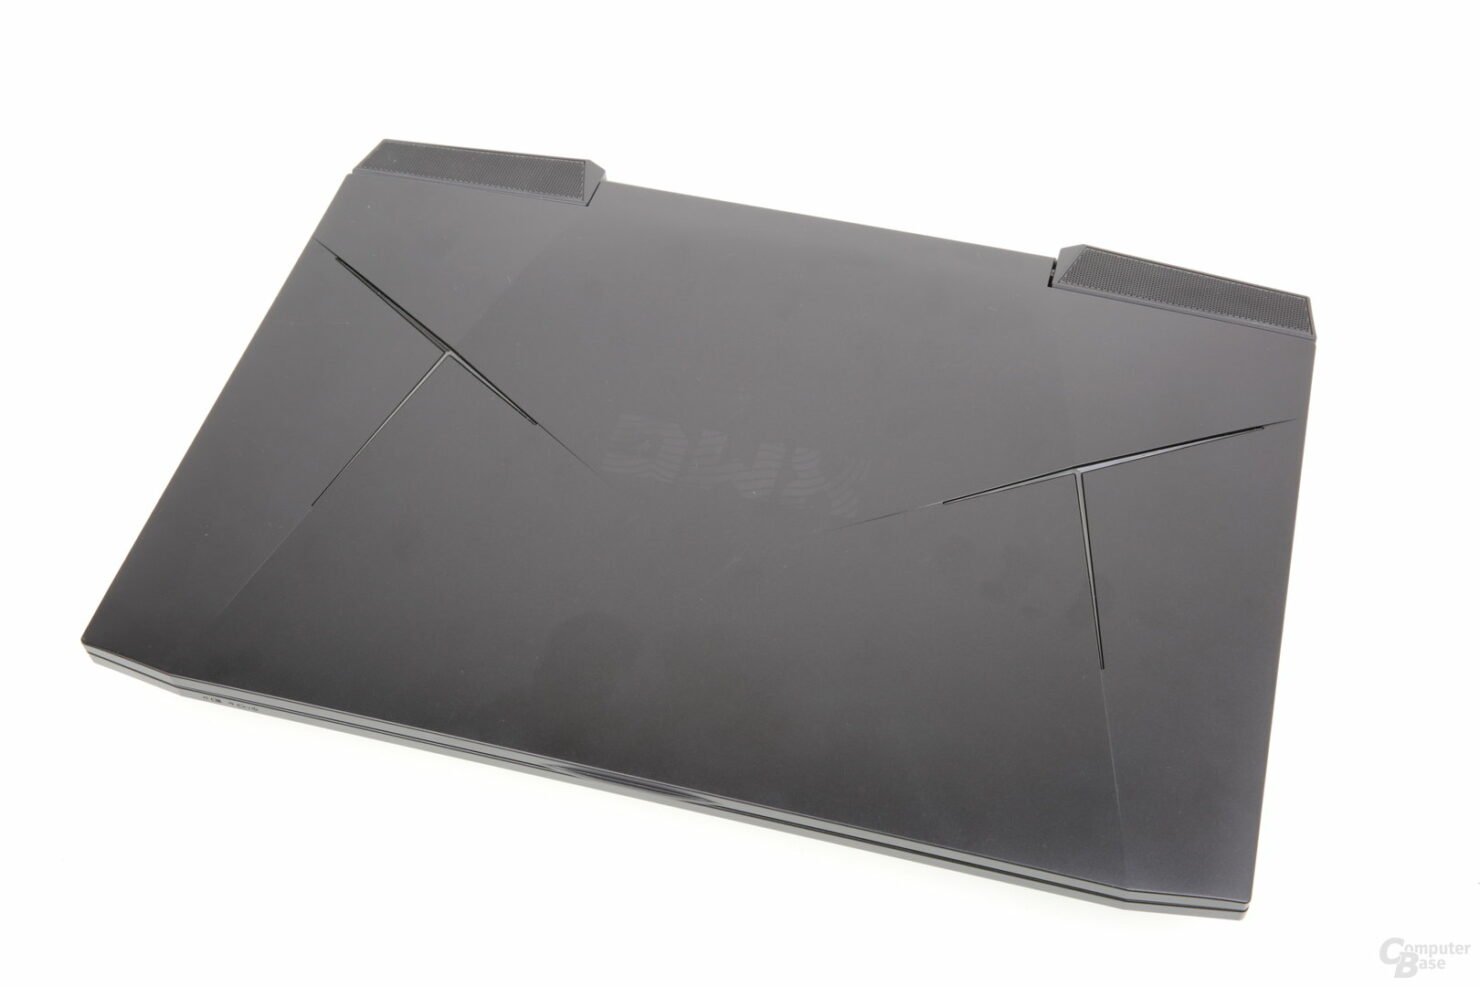 xmg-u726-laptop_geforce-gtx-980_4